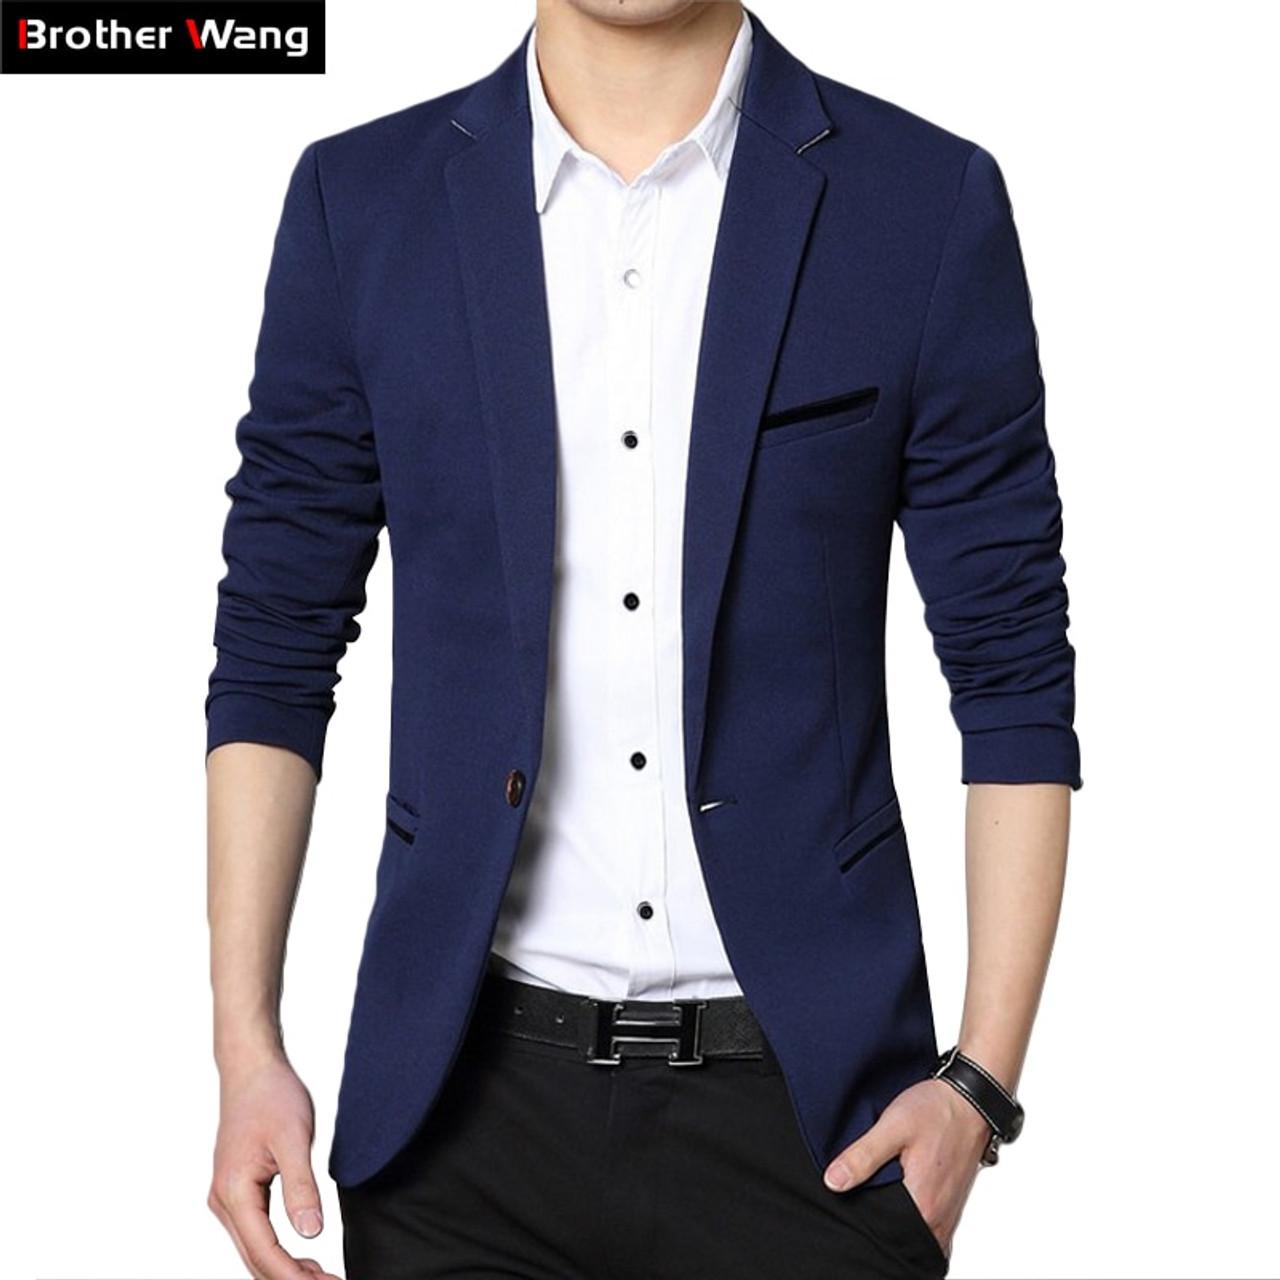 2bbb1286197 2019 Autumn New Men s Blazer Coat Business Casual Fashion Blue Slim Fit Suit  Male Brand Clothing ...